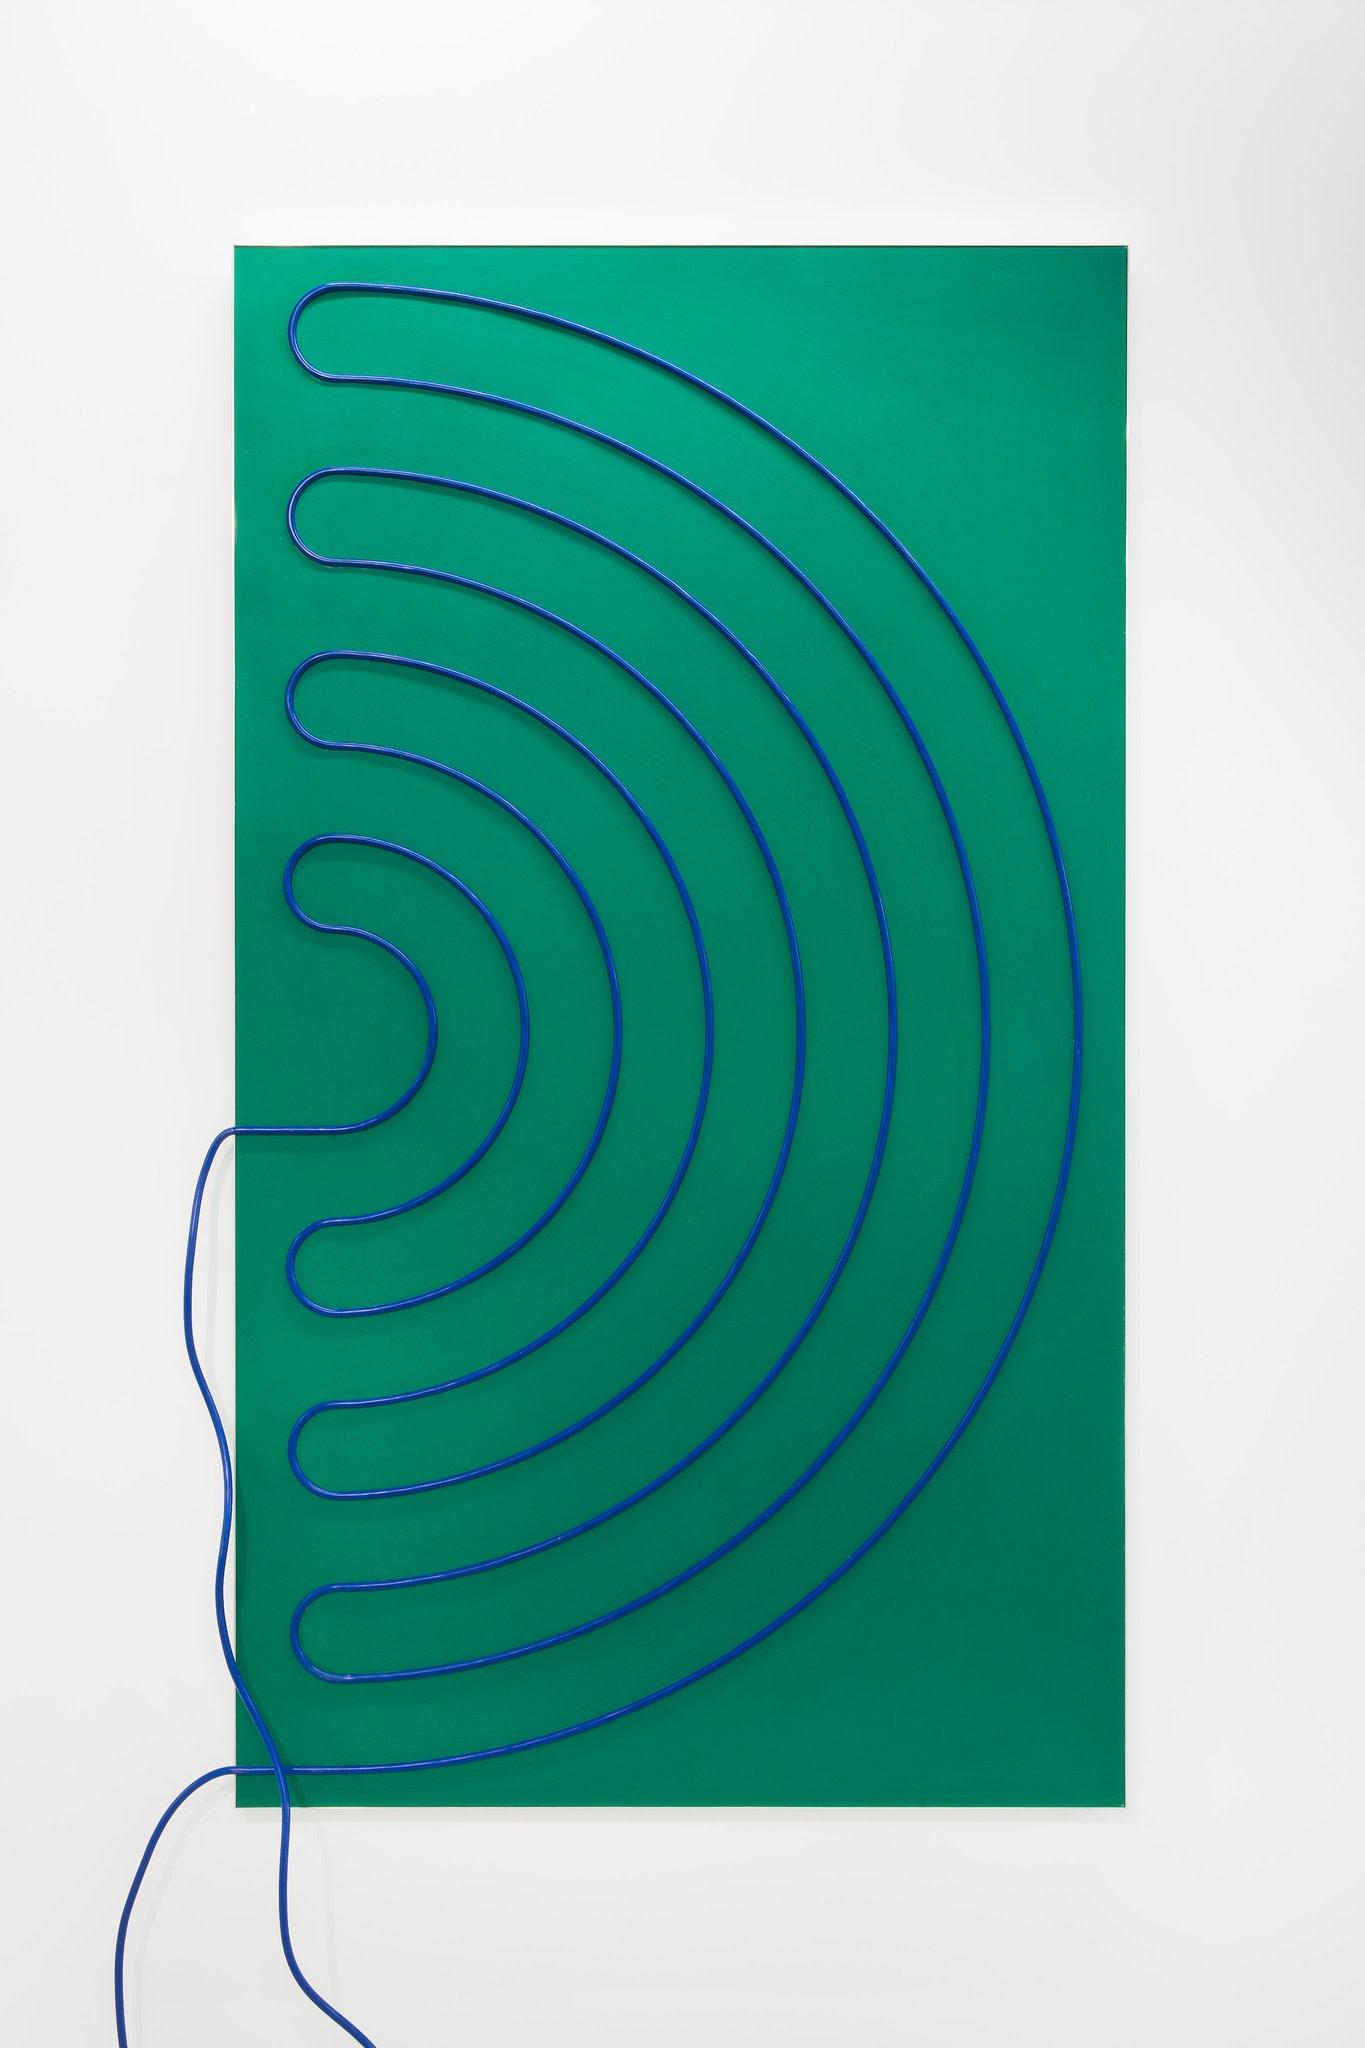 <span class=&#34;link fancybox-details-link&#34;><a href=&#34;/artists/44-jacob-dahlgren/works/8756/&#34;>View Detail Page</a></span><div class=&#34;artist&#34;><strong>Jacob Dahlgren</strong></div> <div class=&#34;title&#34;><em>Third Uncle #2</em>, 2015</div> <div class=&#34;medium&#34;>MDF, acrylic paint, electrical cable, aluminium</div> <div class=&#34;dimensions&#34;>150 x 85 cm<br />59 1/8 x 33 1/2 in</div><div class=&#34;copyright_line&#34;>Copyright The Artist</div>